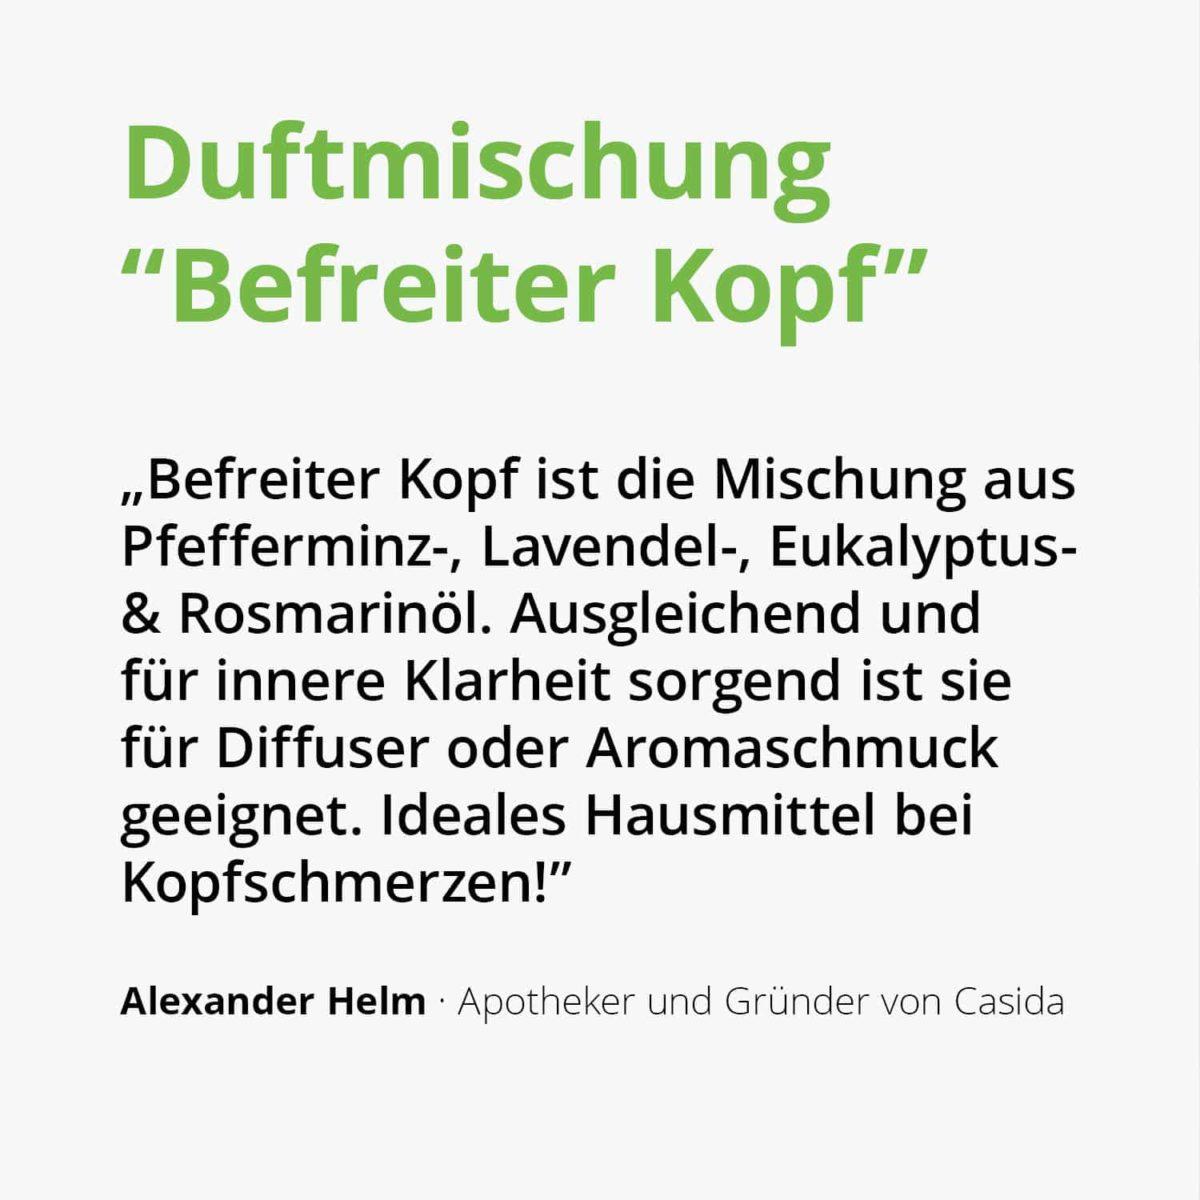 Casida Duftmischung Befreiter Kopf - 5 ml 17394523 PZN Apotheke Kopfschmerzen Aromatherapie Aromapflege Aromaschmuck Diffuser2